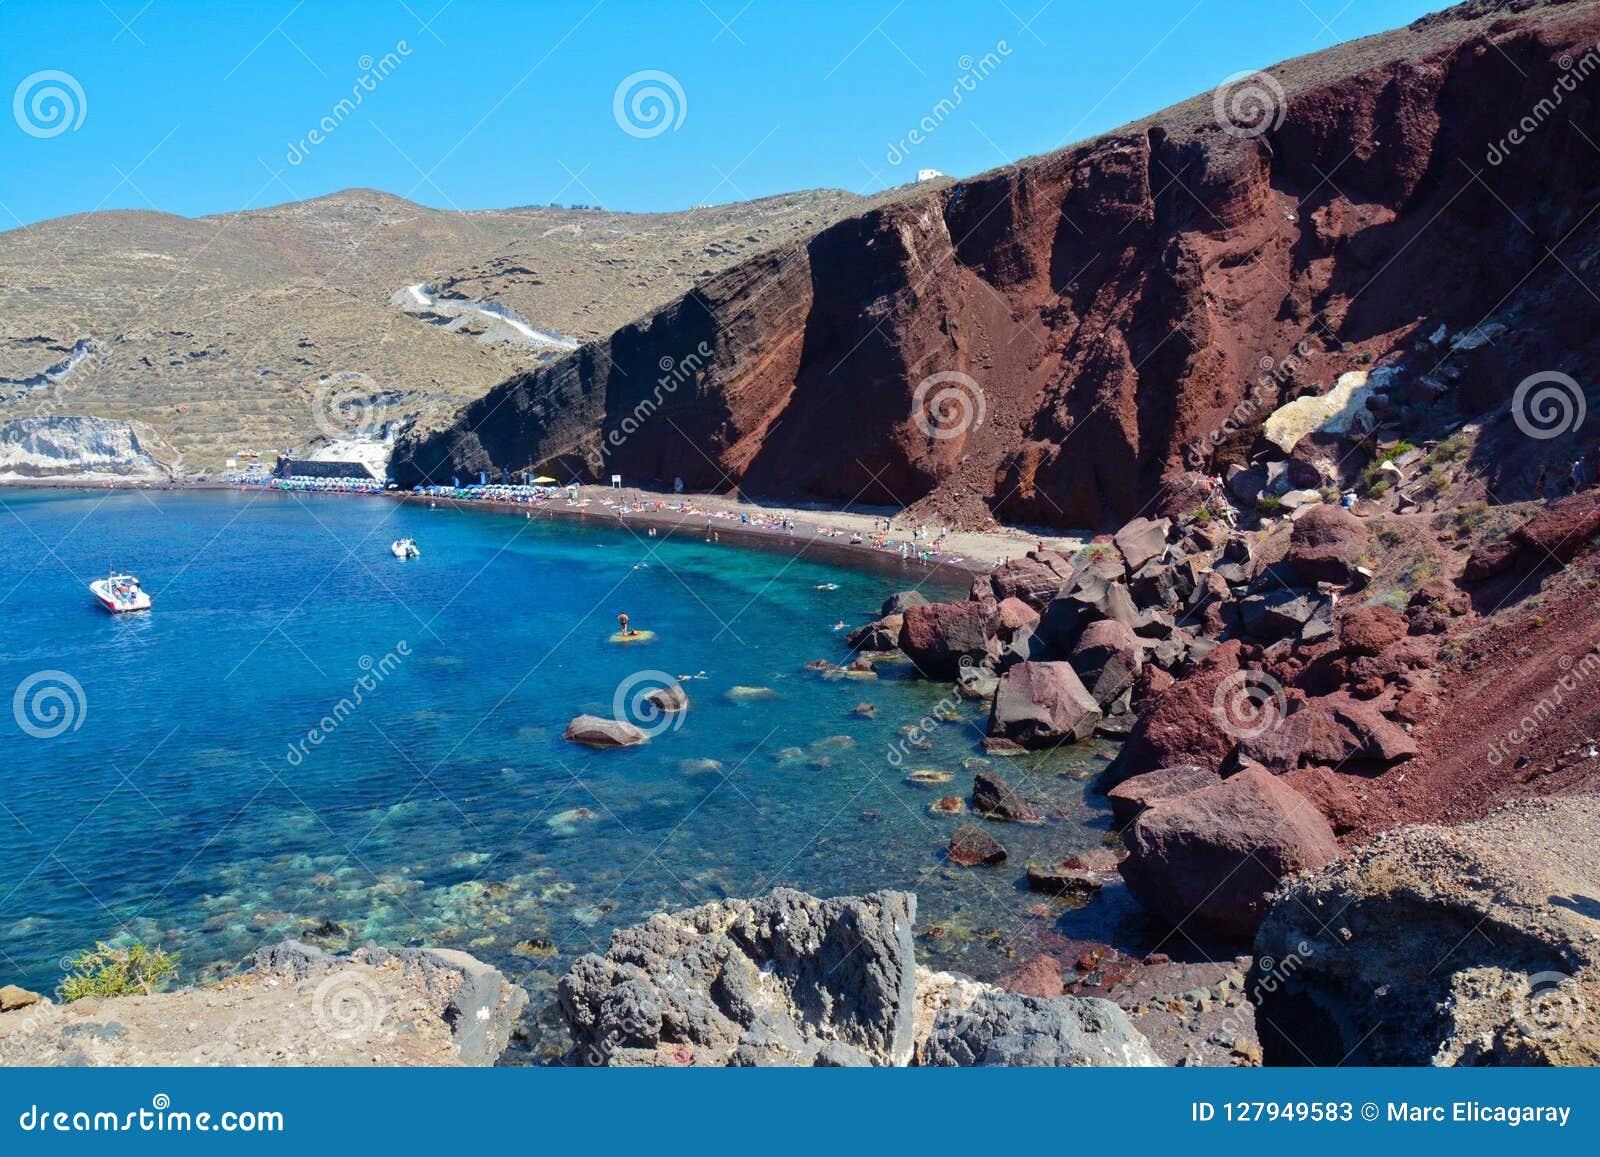 Red Beach In Santorini Greece Stock Image Image Of Deep